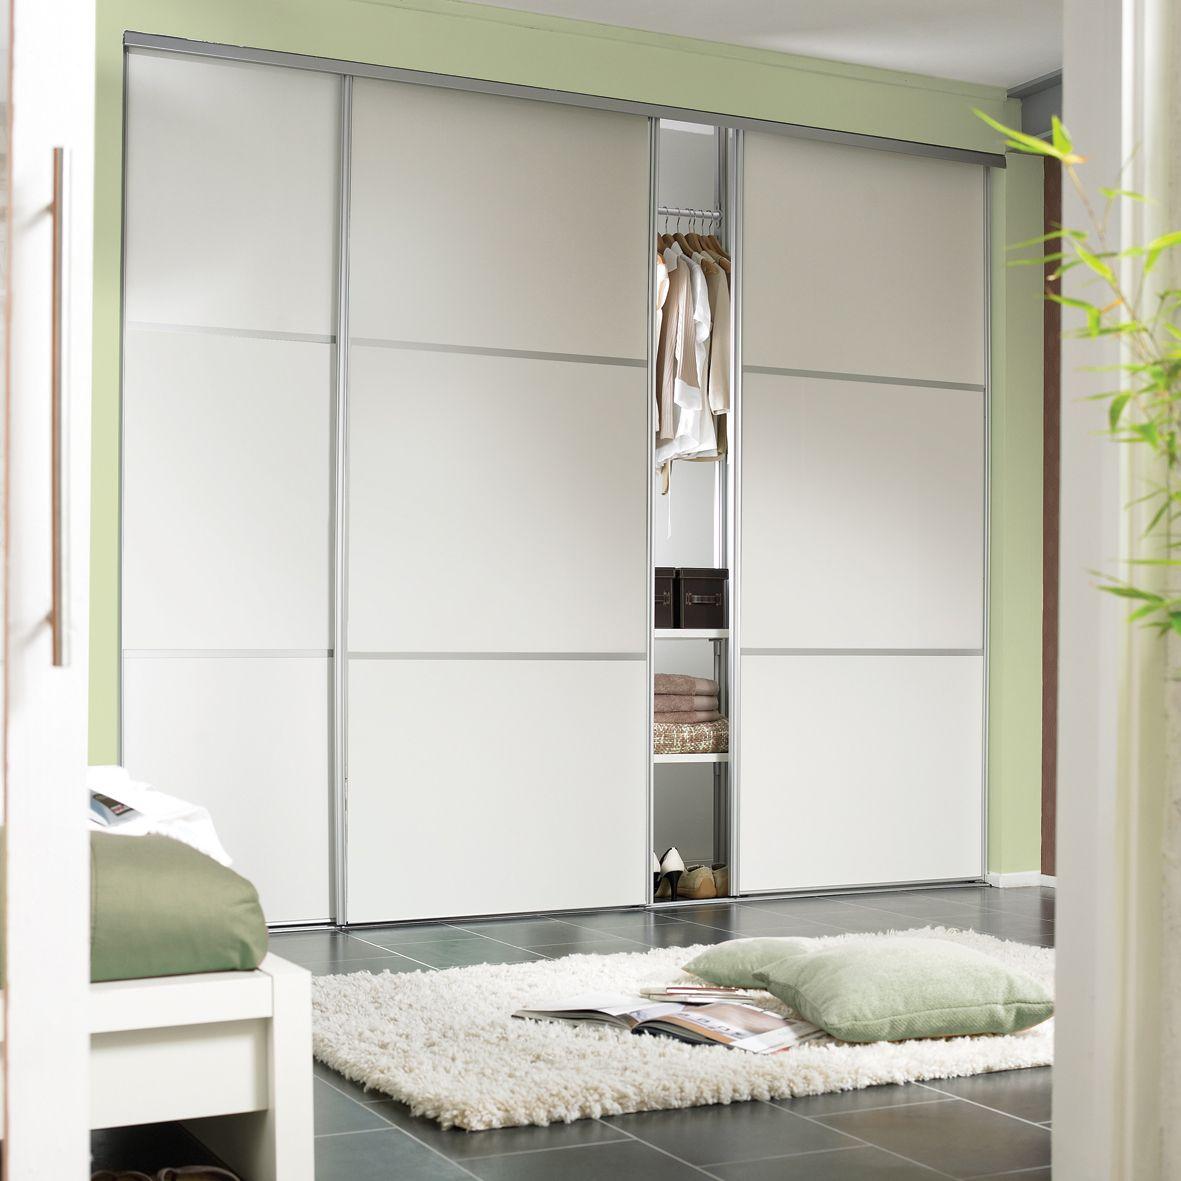 Cheap Bedroom Design Ideas Sliding Door Wardrobes: Pin By Bedrooms Plus On Bedroom Design Ideas